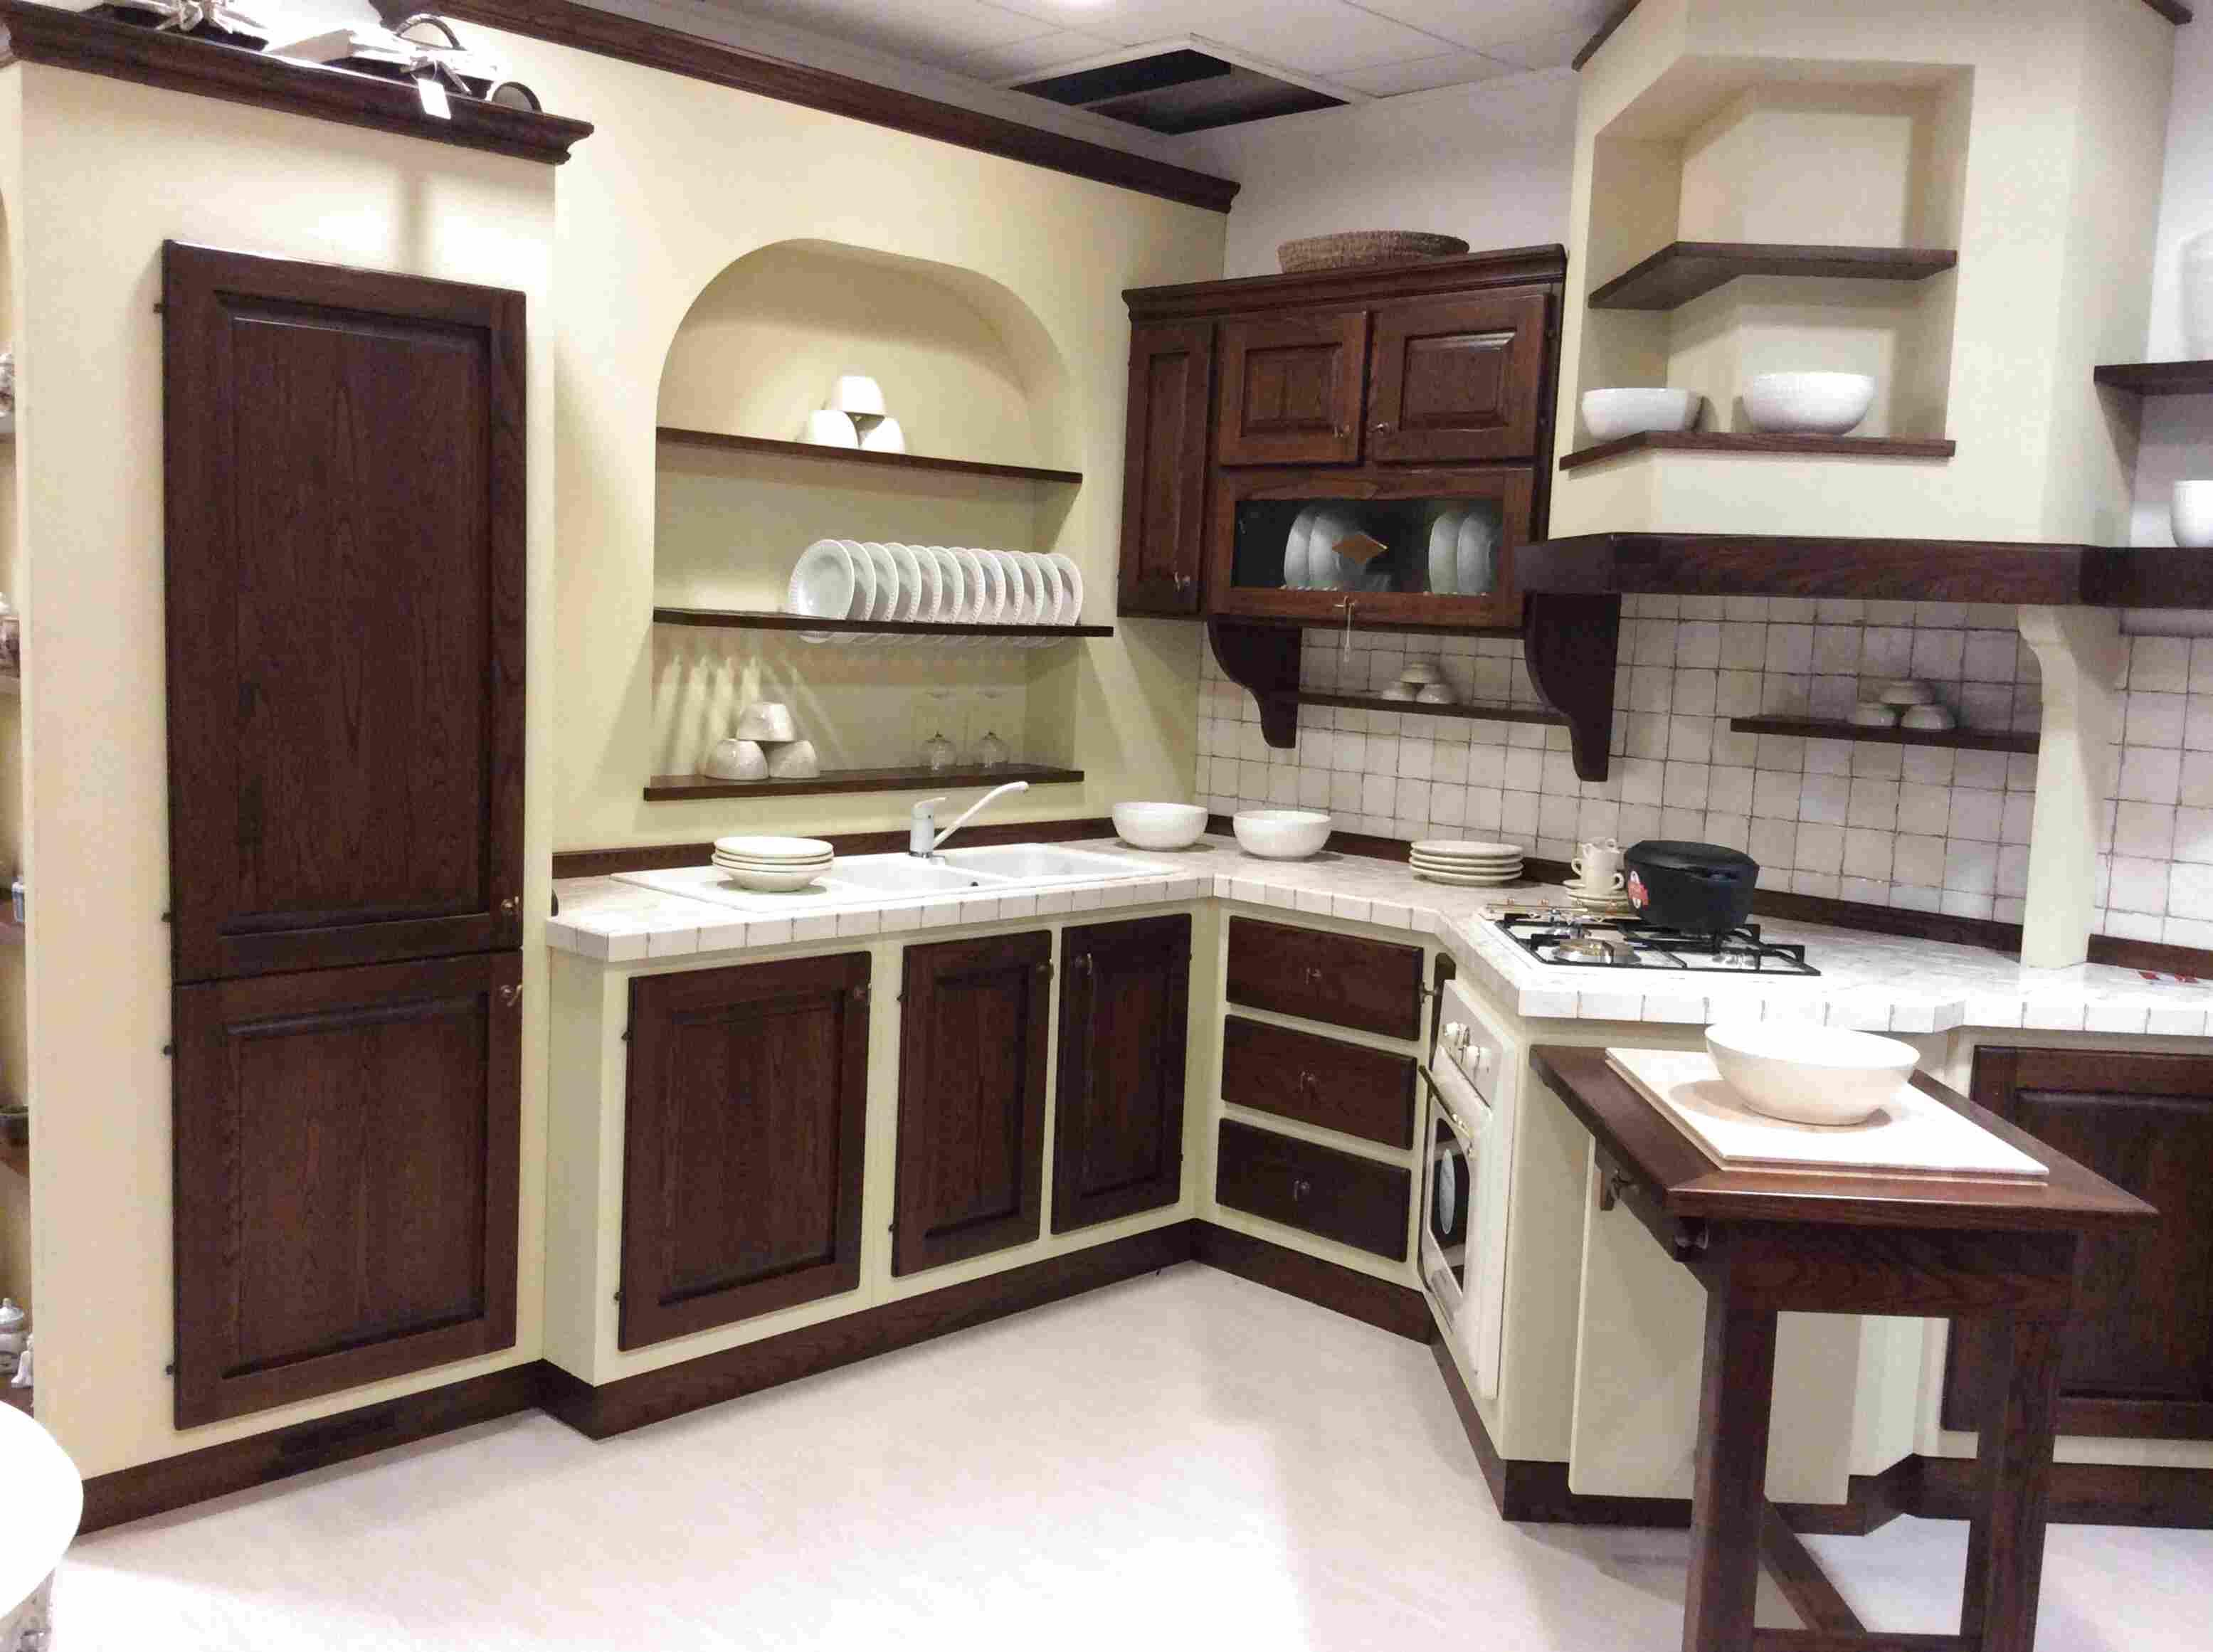 Opinioni Su Arrital Cucine cucine finta muratura